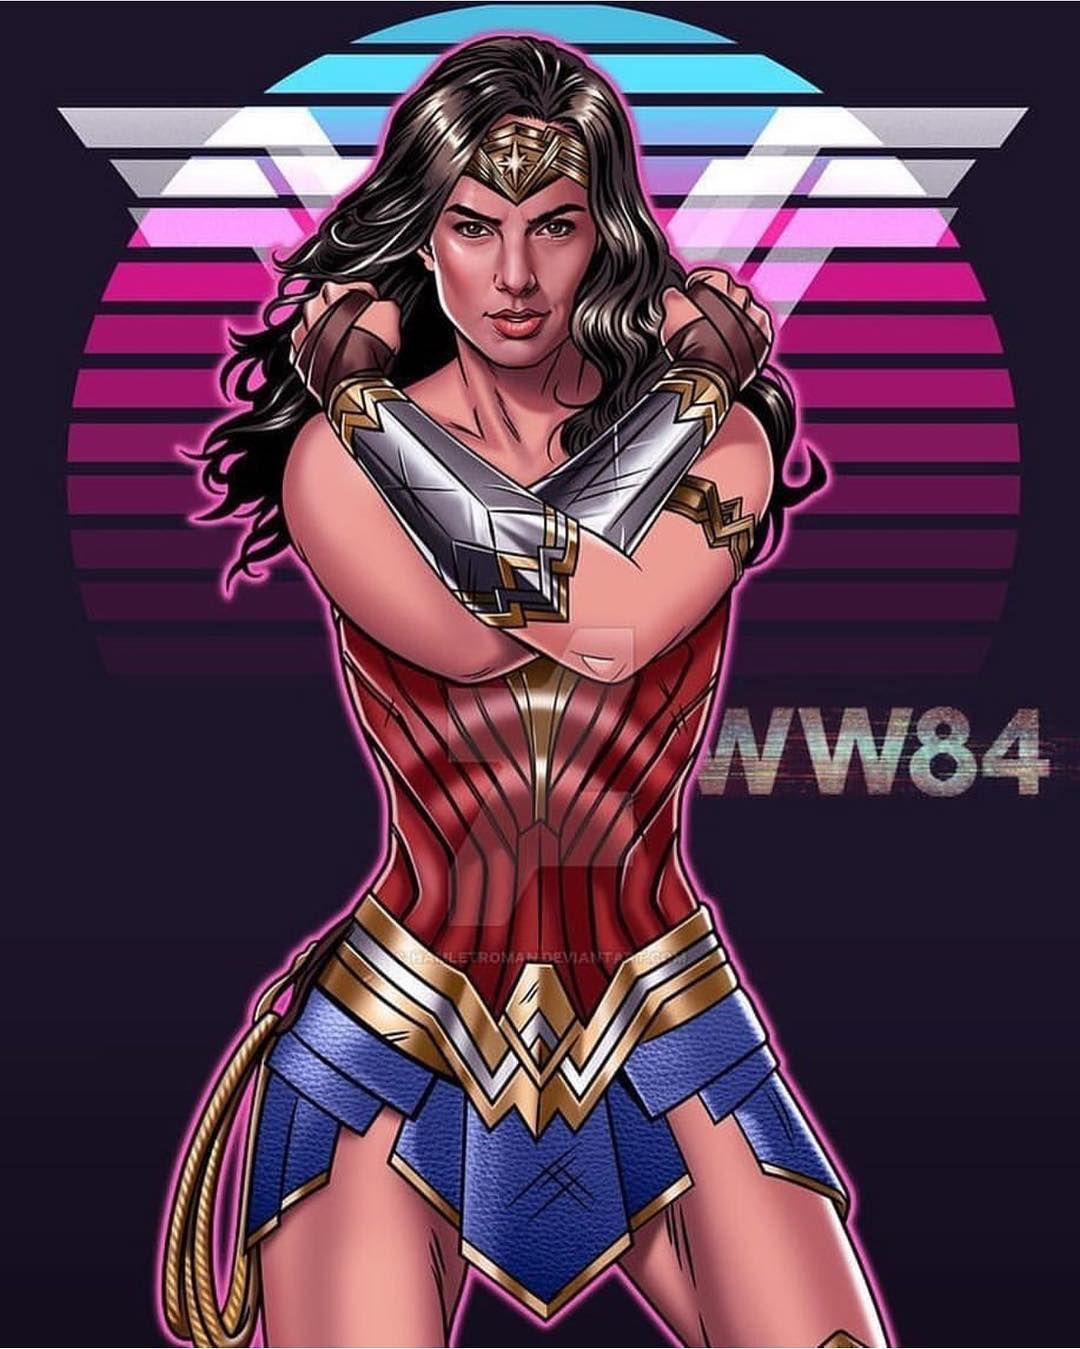 Gal Gadot Is Wonder Woman On Instagram Wonder Woman 1984 Gal Gadot Art By Hamletromanarte Sharing My Res Wonder Woman Comic Wonder Woman Wonder Woman Art